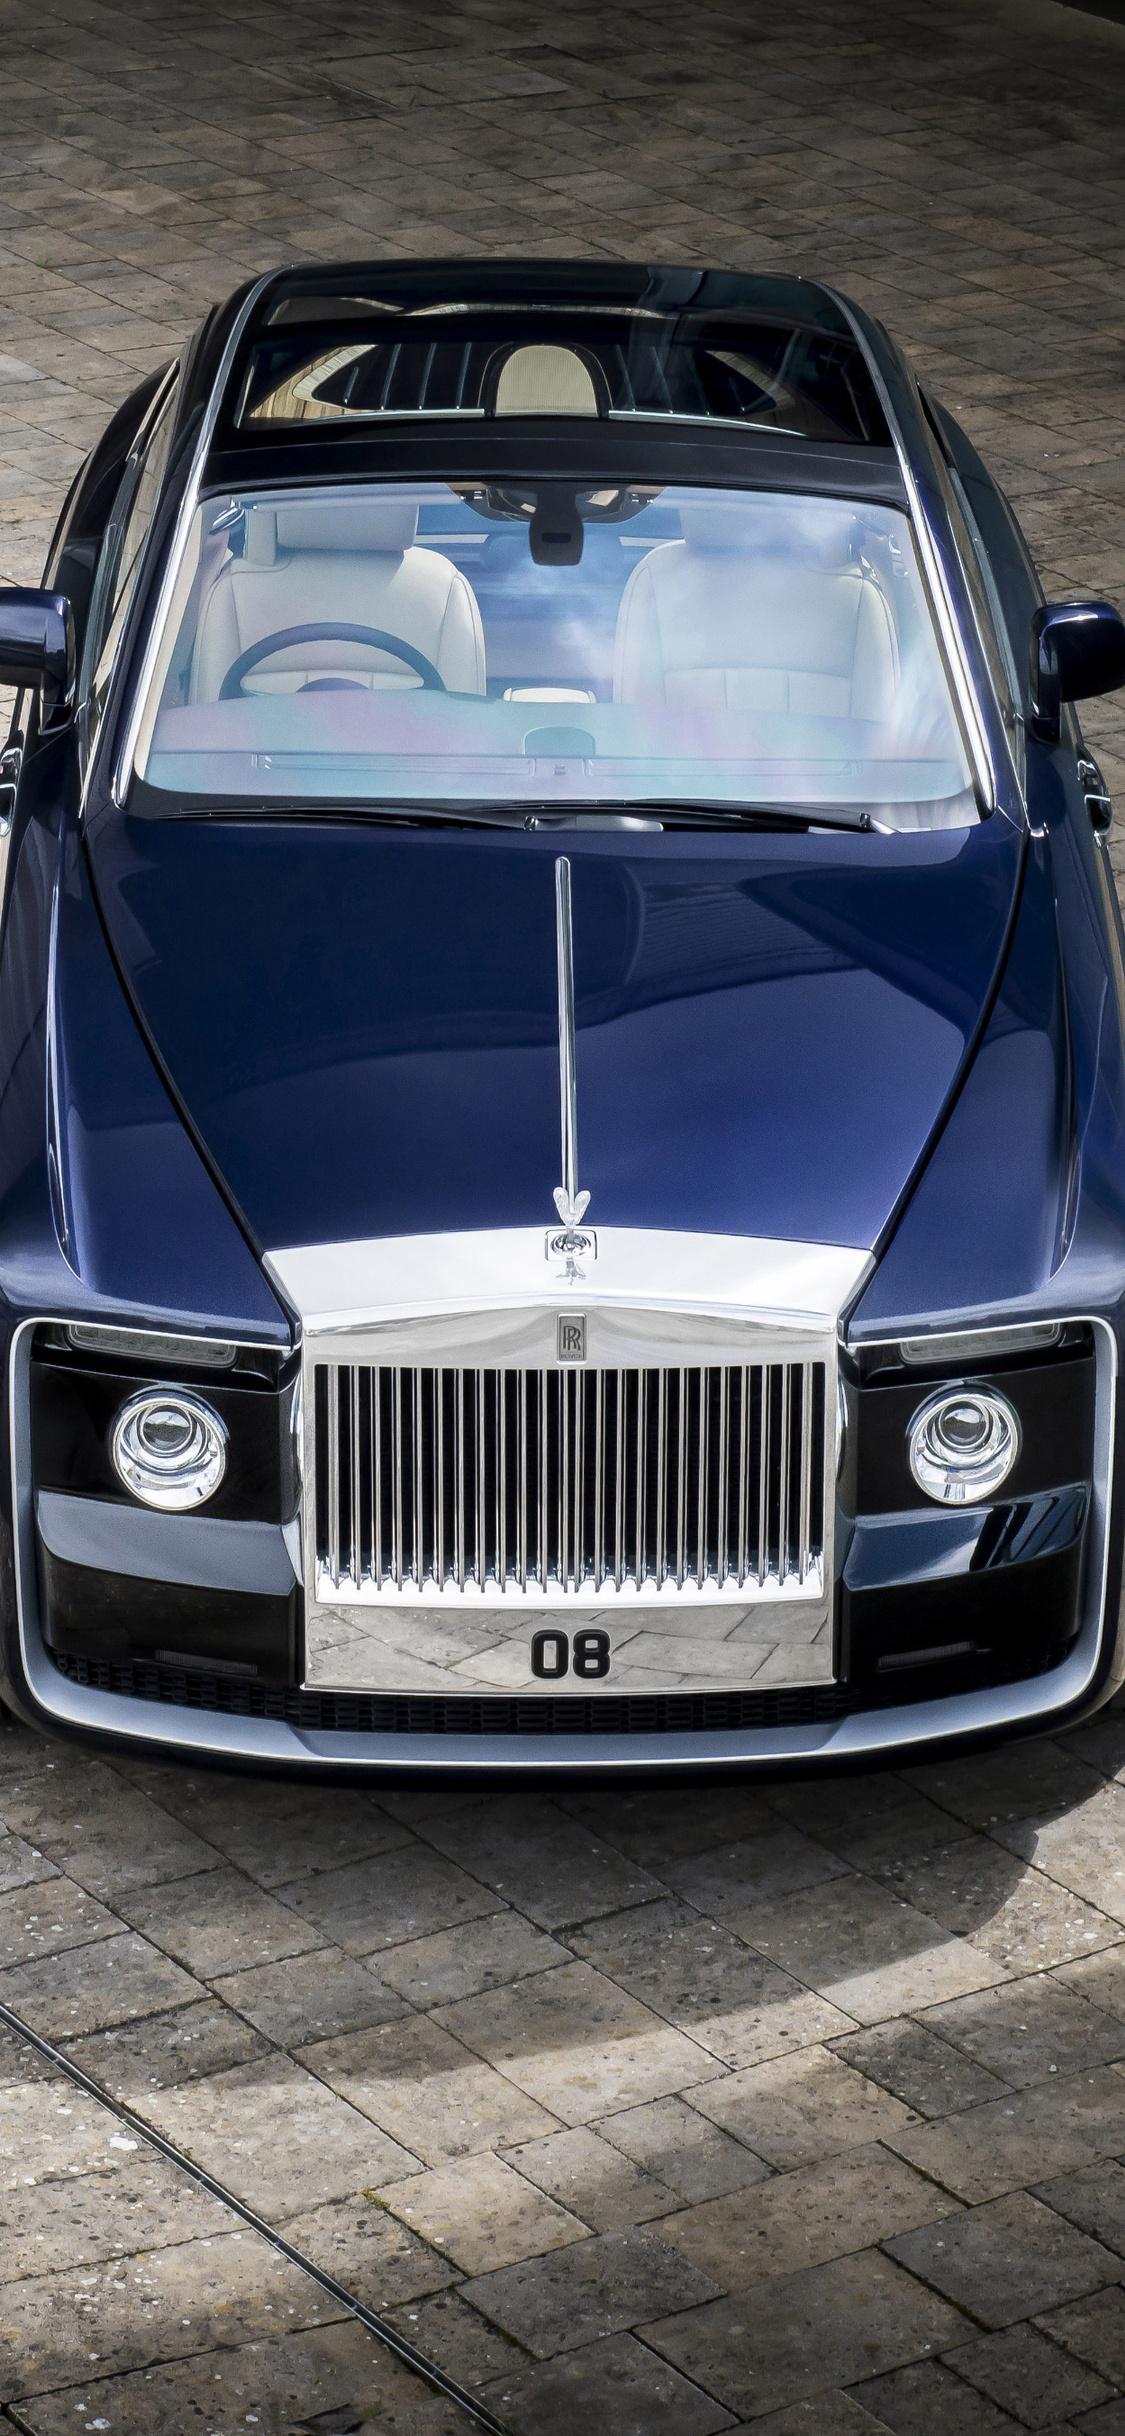 1125x2436 Rolls Royce Sweptail Iphone Xs Iphone 10 Iphone X Hd 4k